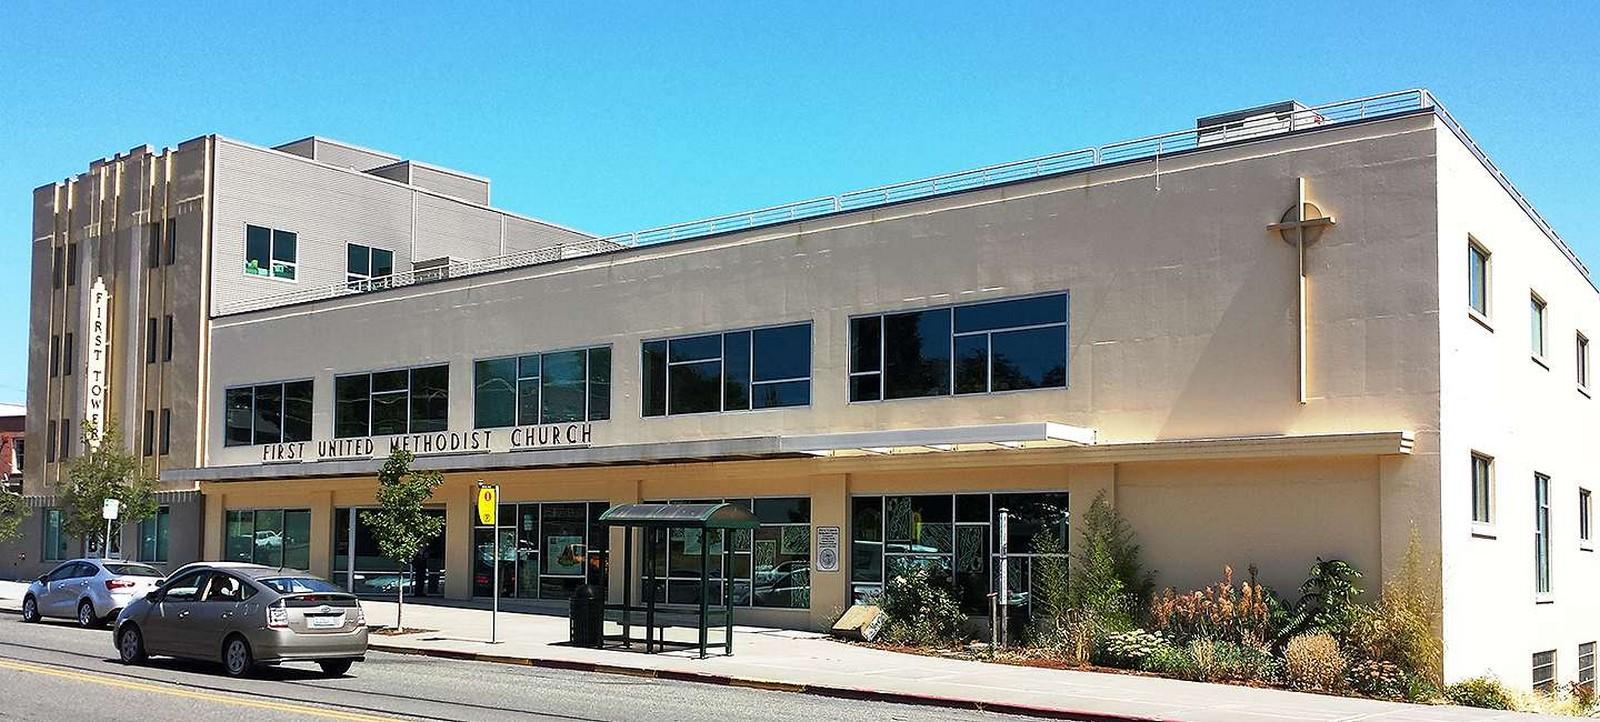 Architects in Tacoma - Top 30 Architects in Tacoma - Sheet5